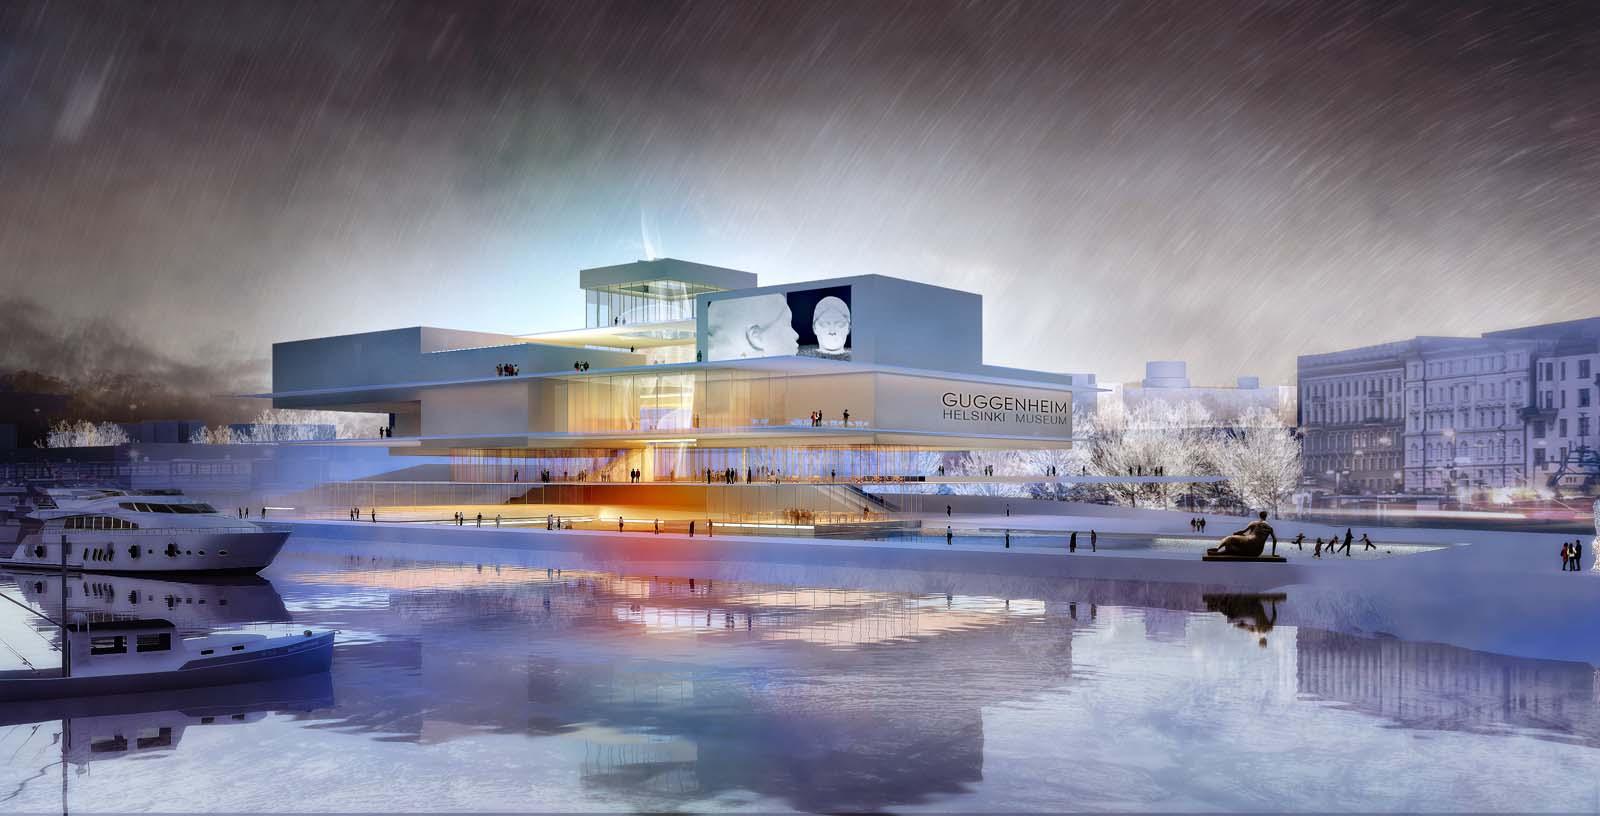 Guggenheim_museum_01_Architecture_IDOM_computer_graphics_Poliedro